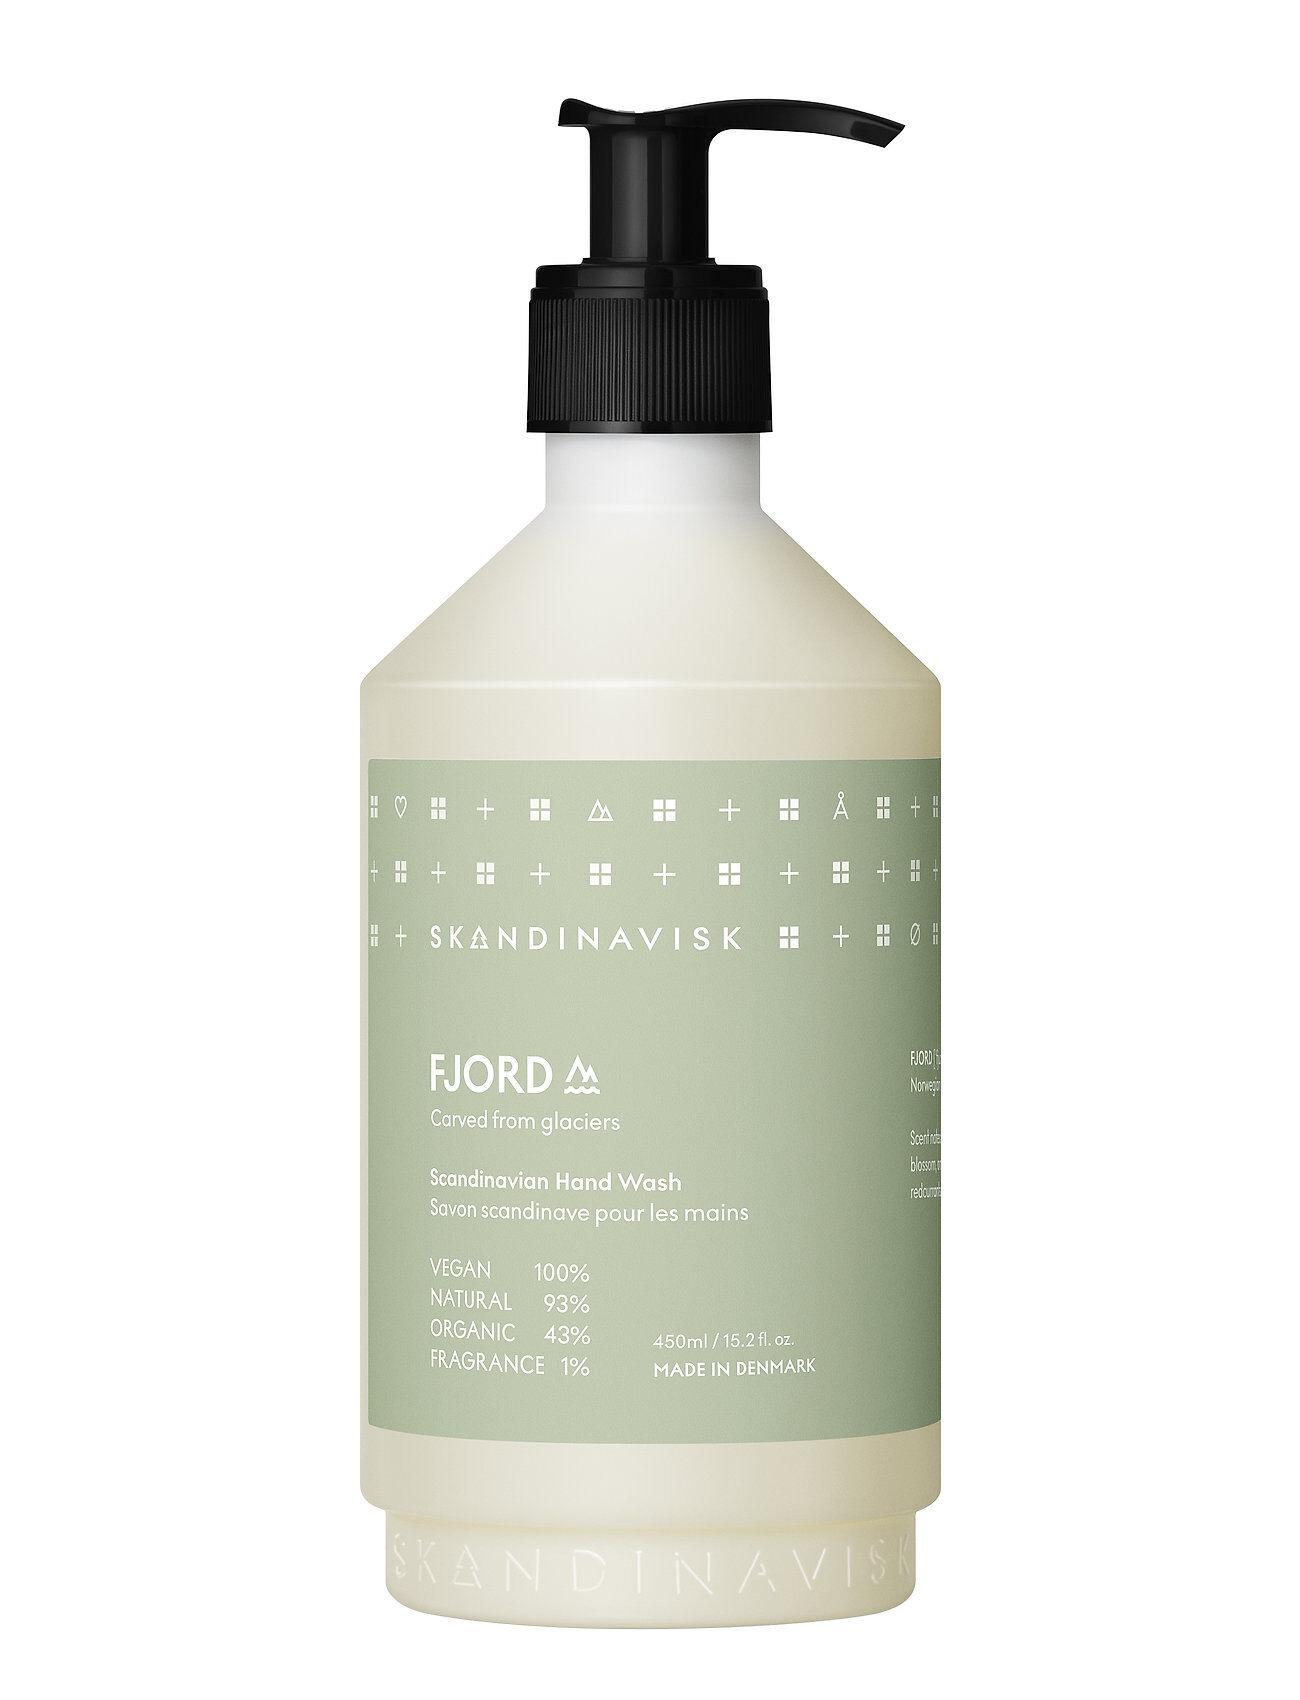 Skandinavisk Fjord Hand Wash 450ml Käsisaippua Nude Skandinavisk